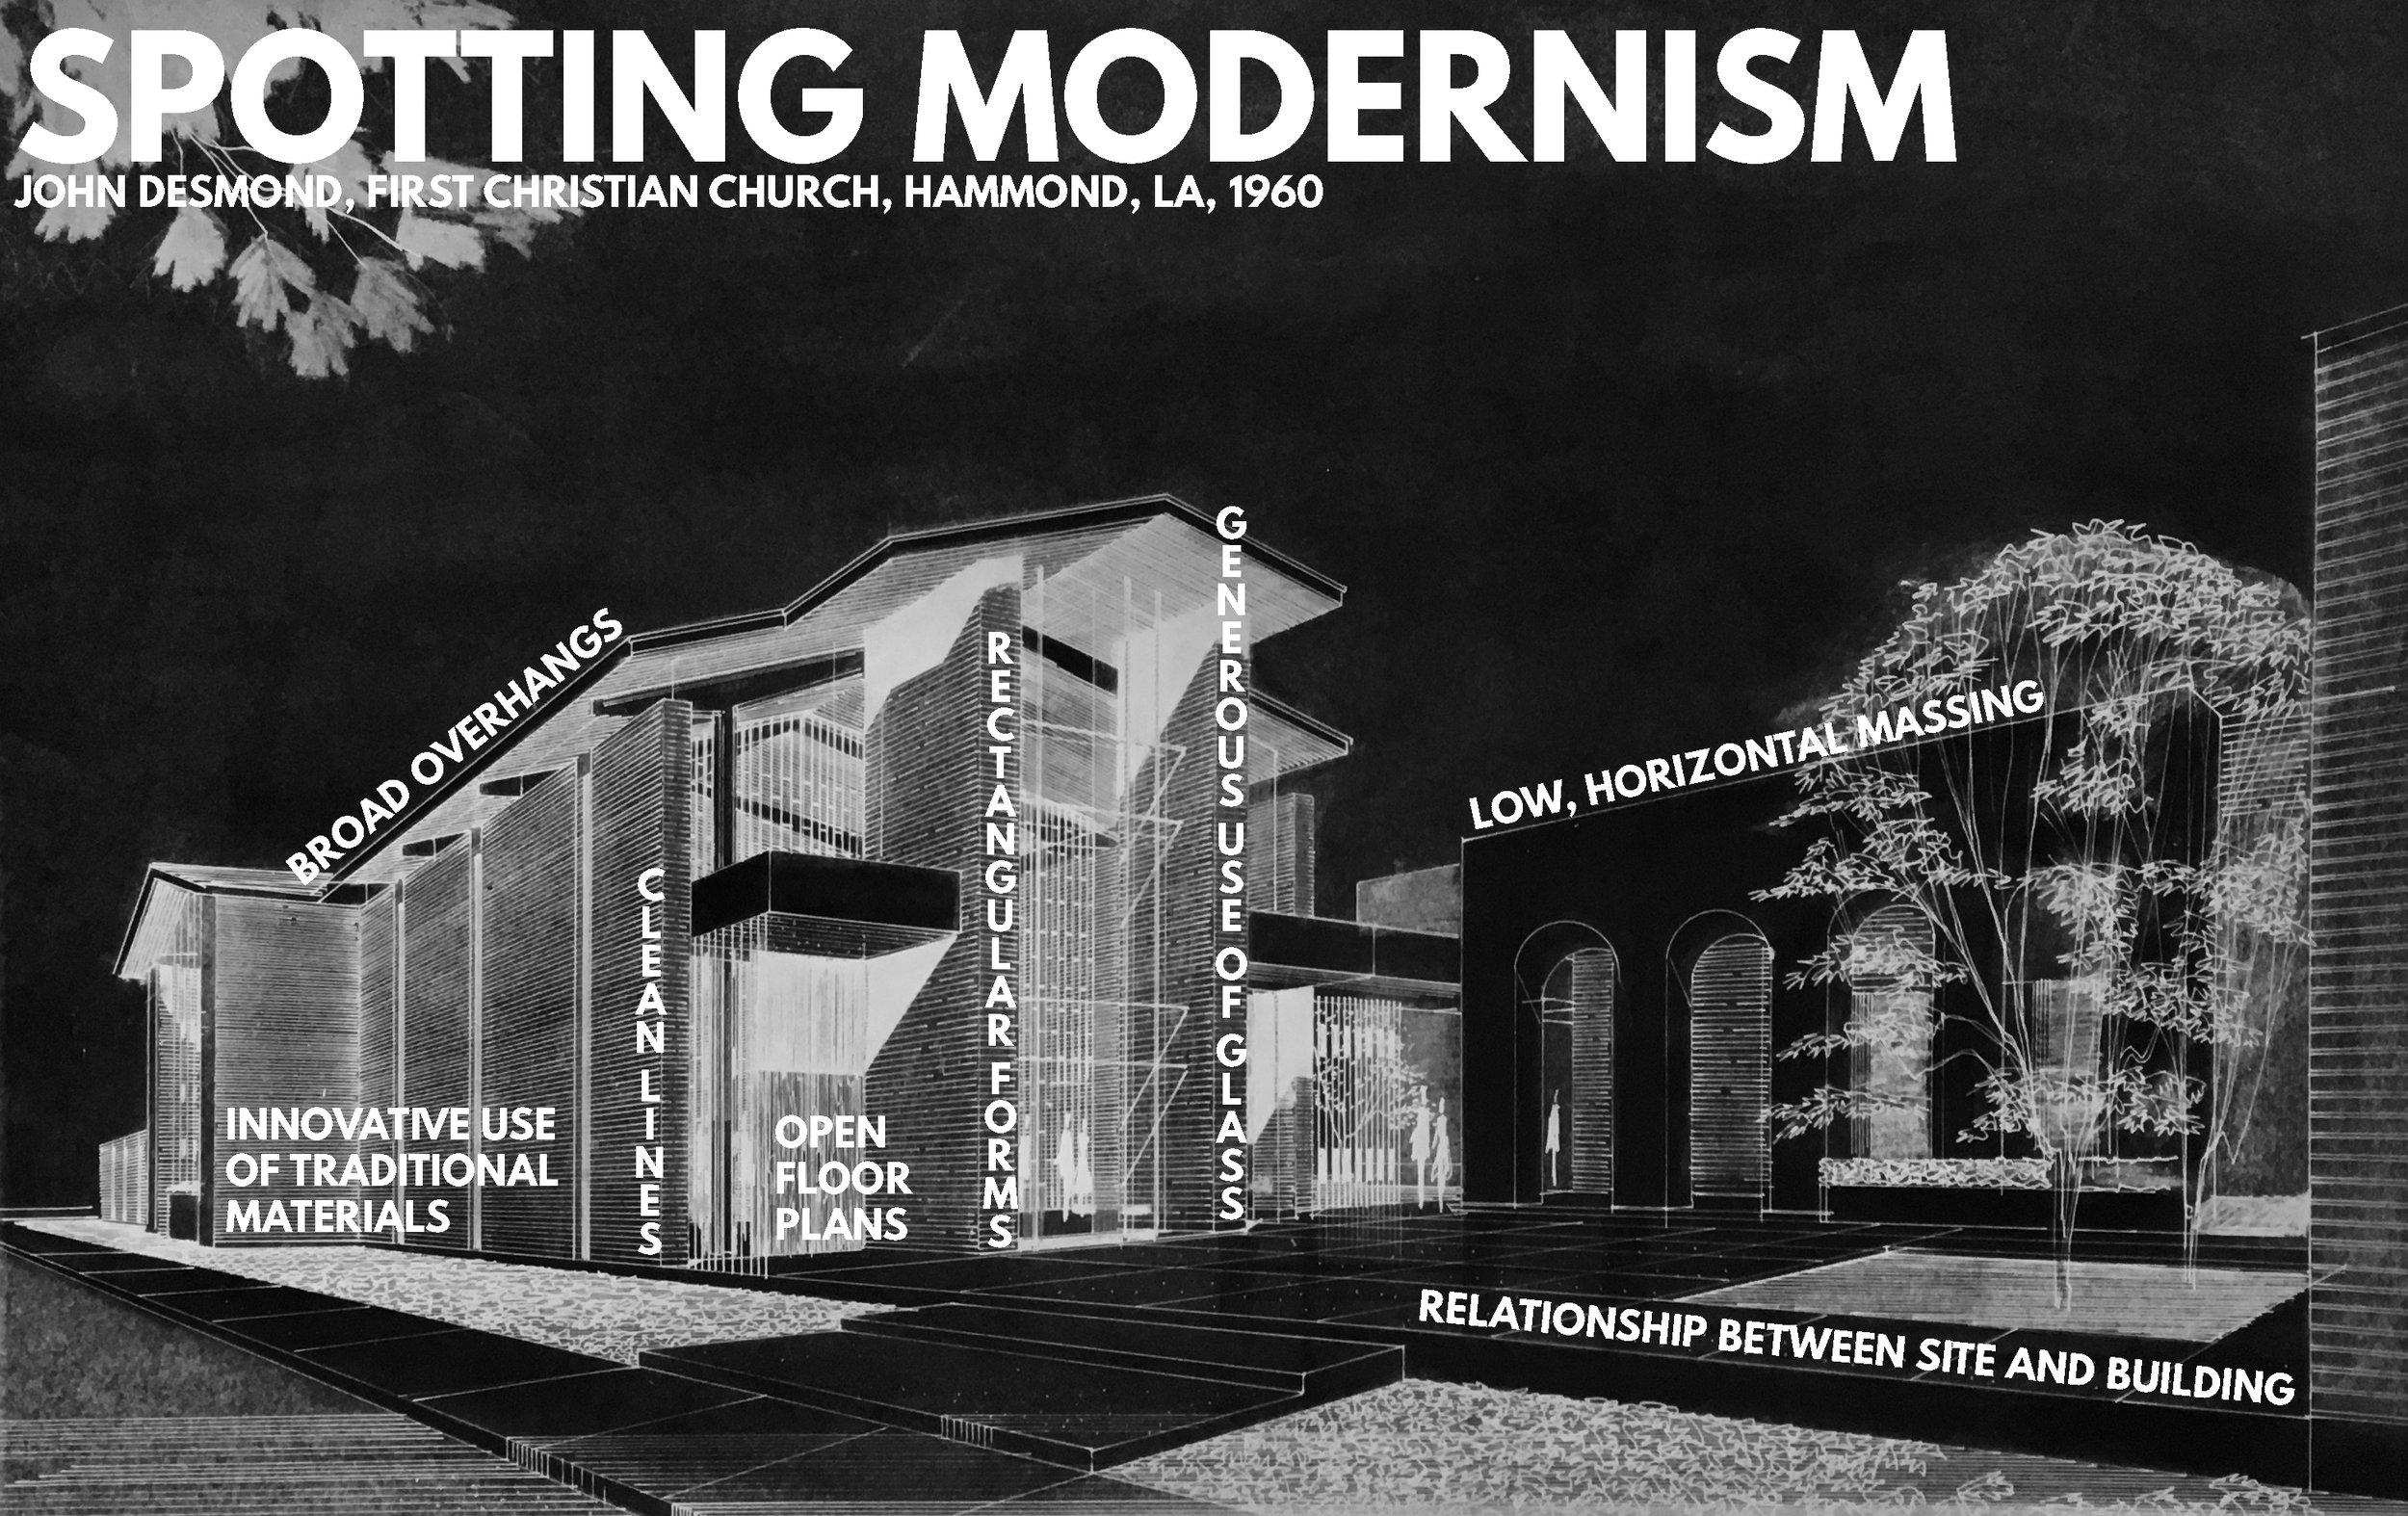 spotting modernism_john desmond copy.jpg